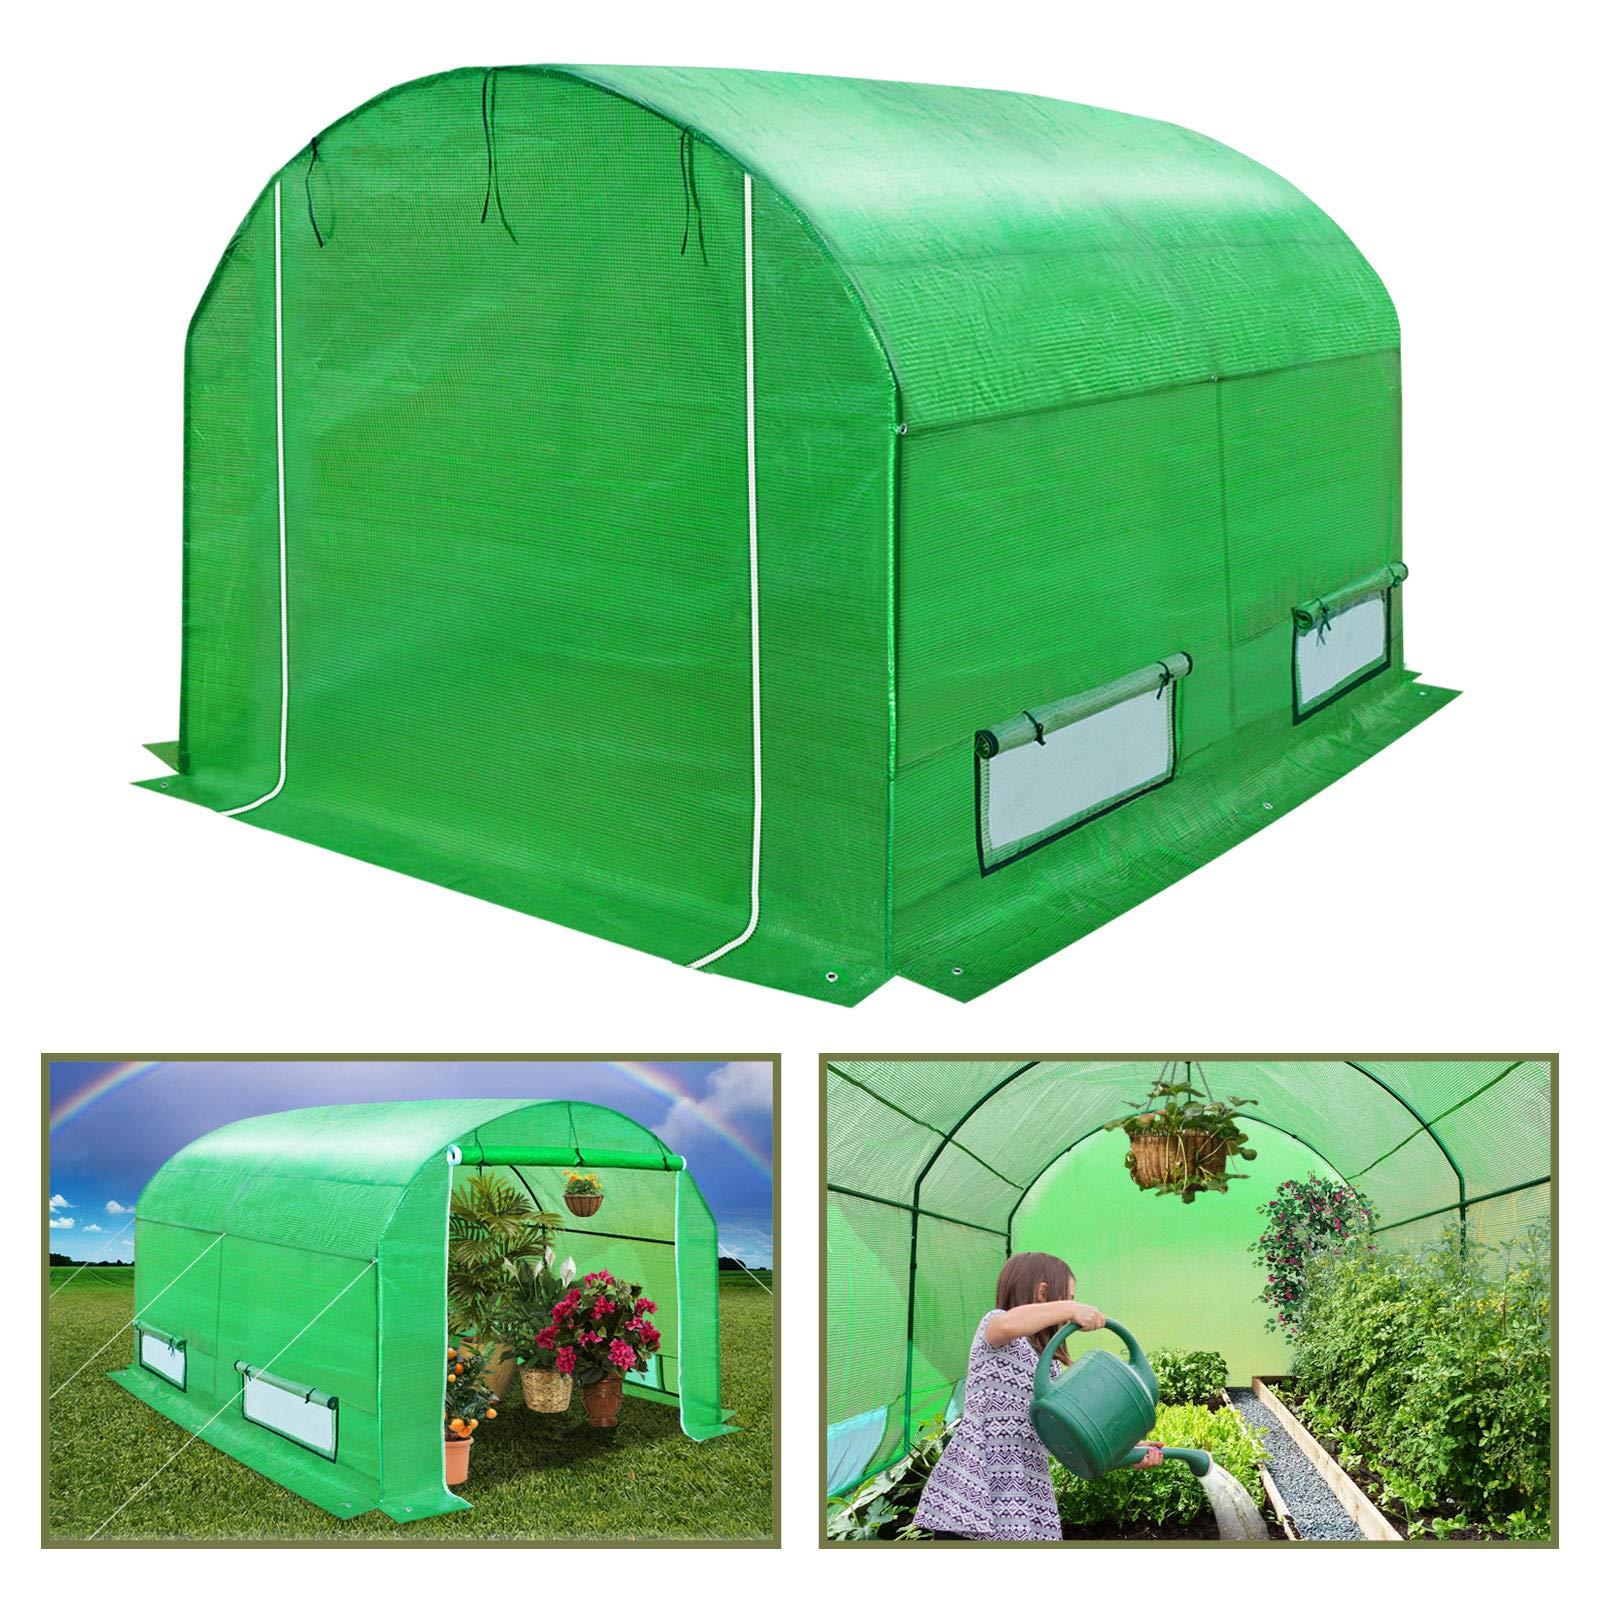 BenefitUSA Hot Green House 10'x7'x6' Larger Walk in Outdoor Canopy Gazebo Plant Gardening Greenhouse